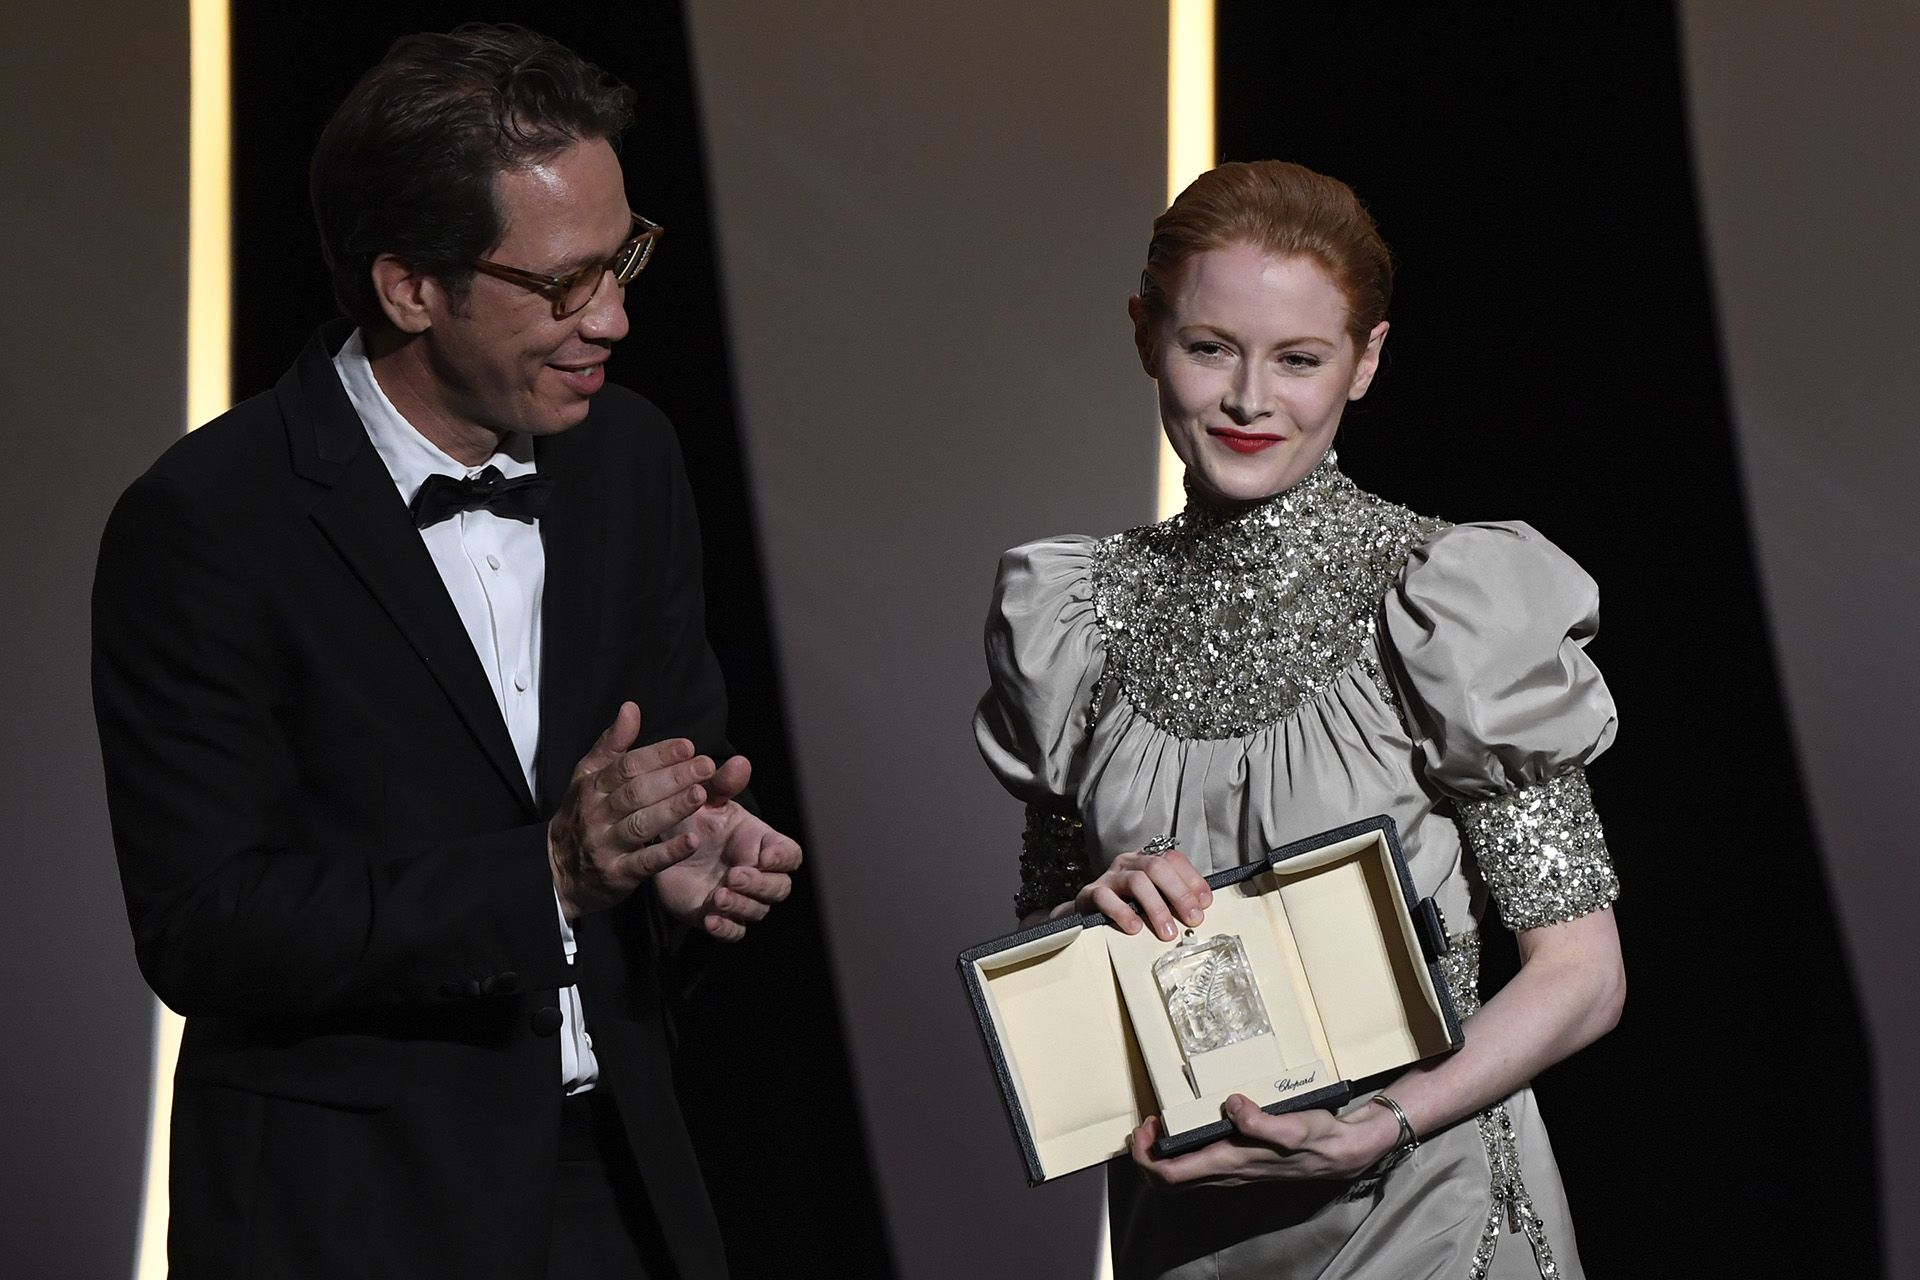 La actriz británica Emily Beecham junto al actor francés Reda Kateb (Photo by CHRISTOPHE SIMON / AFP)